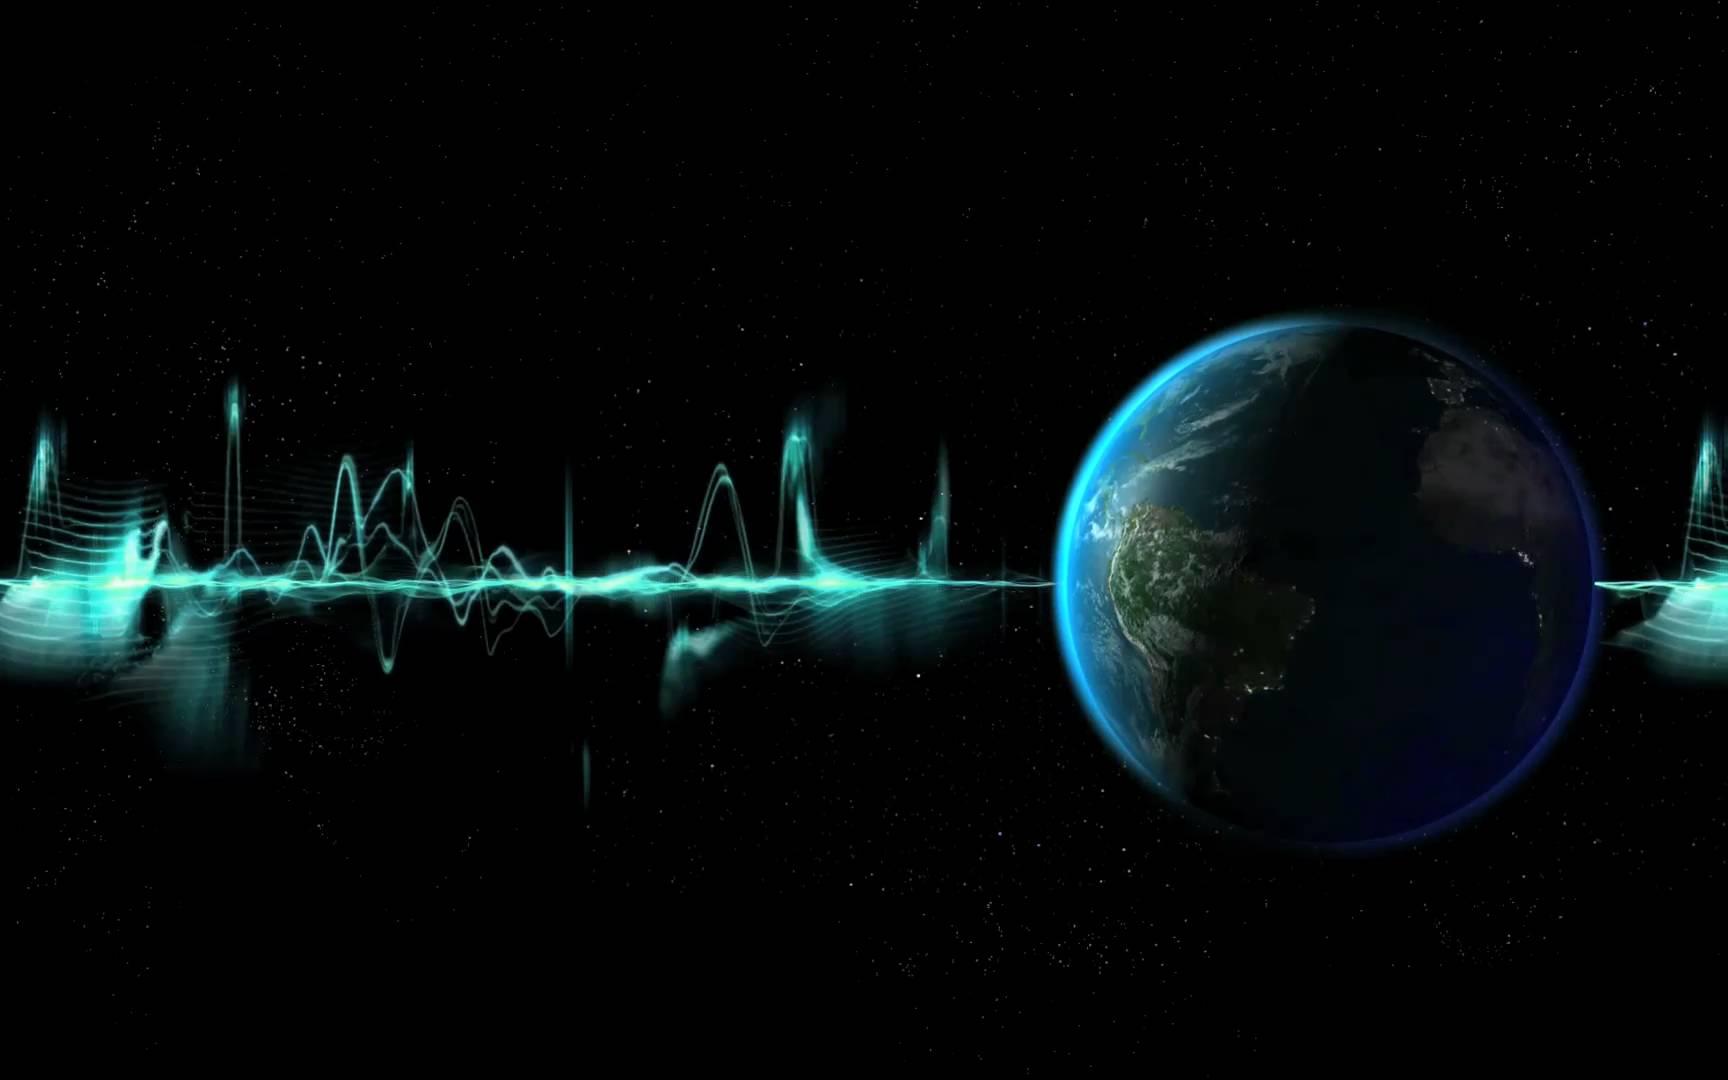 HD Dreamscene Animated rotating earth Space Wallpaper 1728x1080